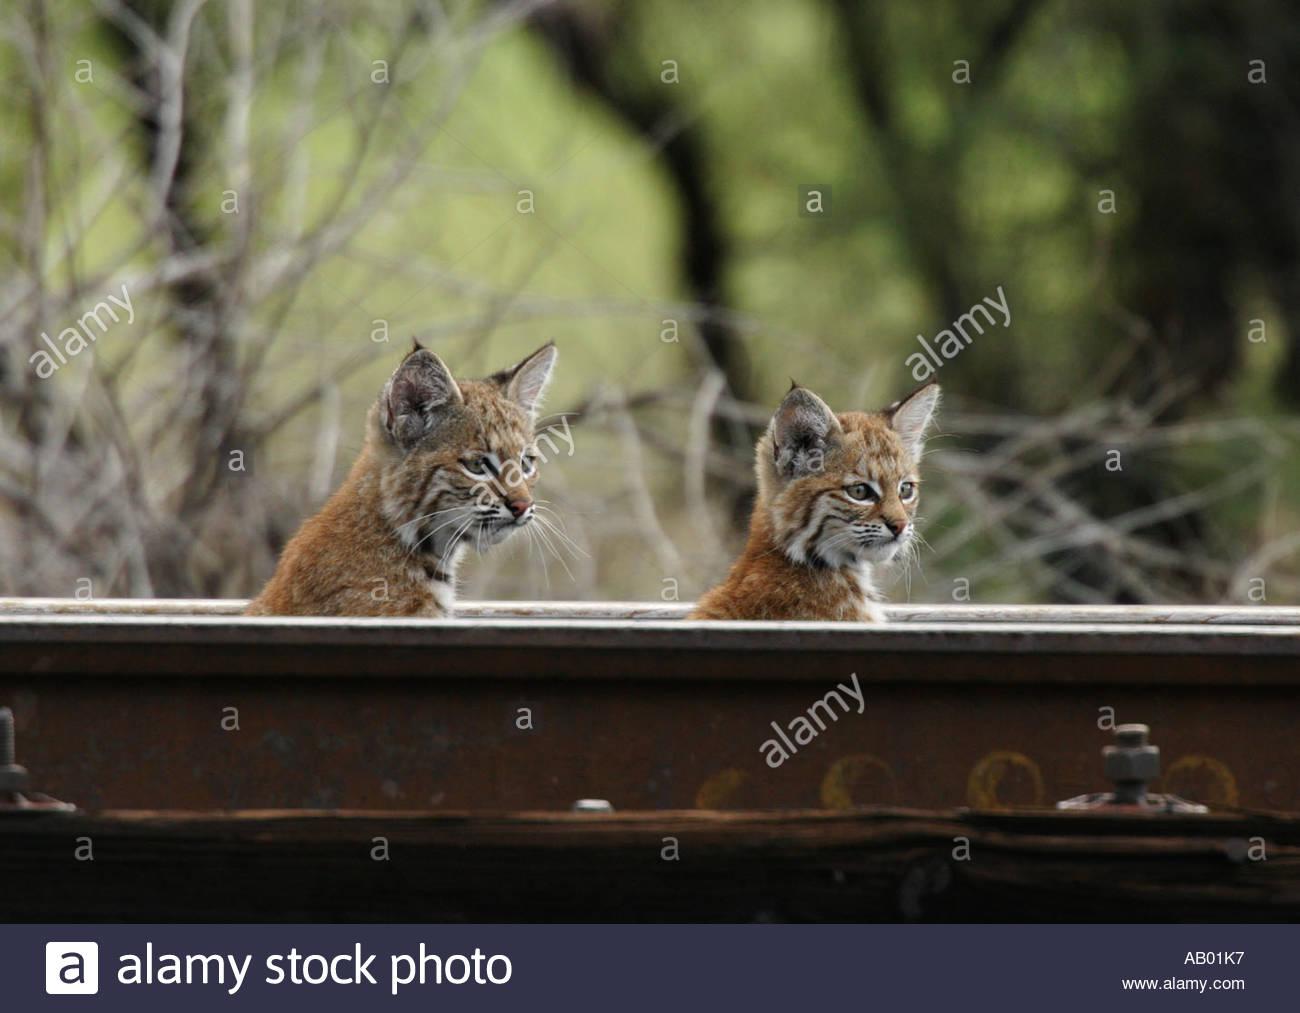 bobcat-kittens-peering-over-railroad-rail-lynx-rufus-AB01K7.jpg